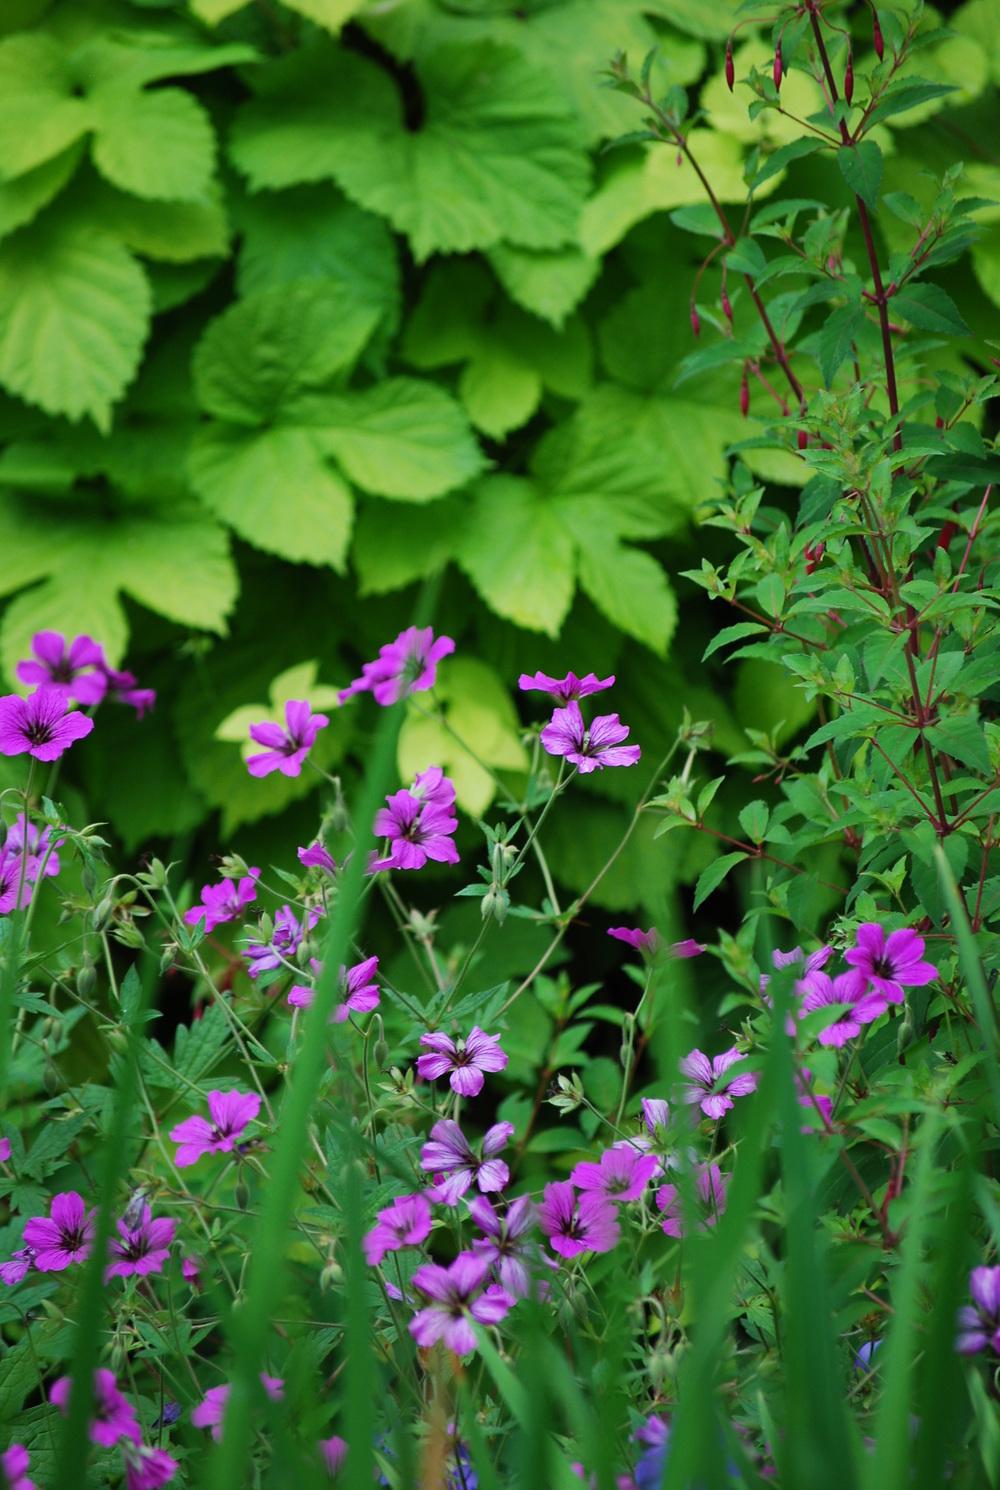 garden june 28,2014 007.JPG